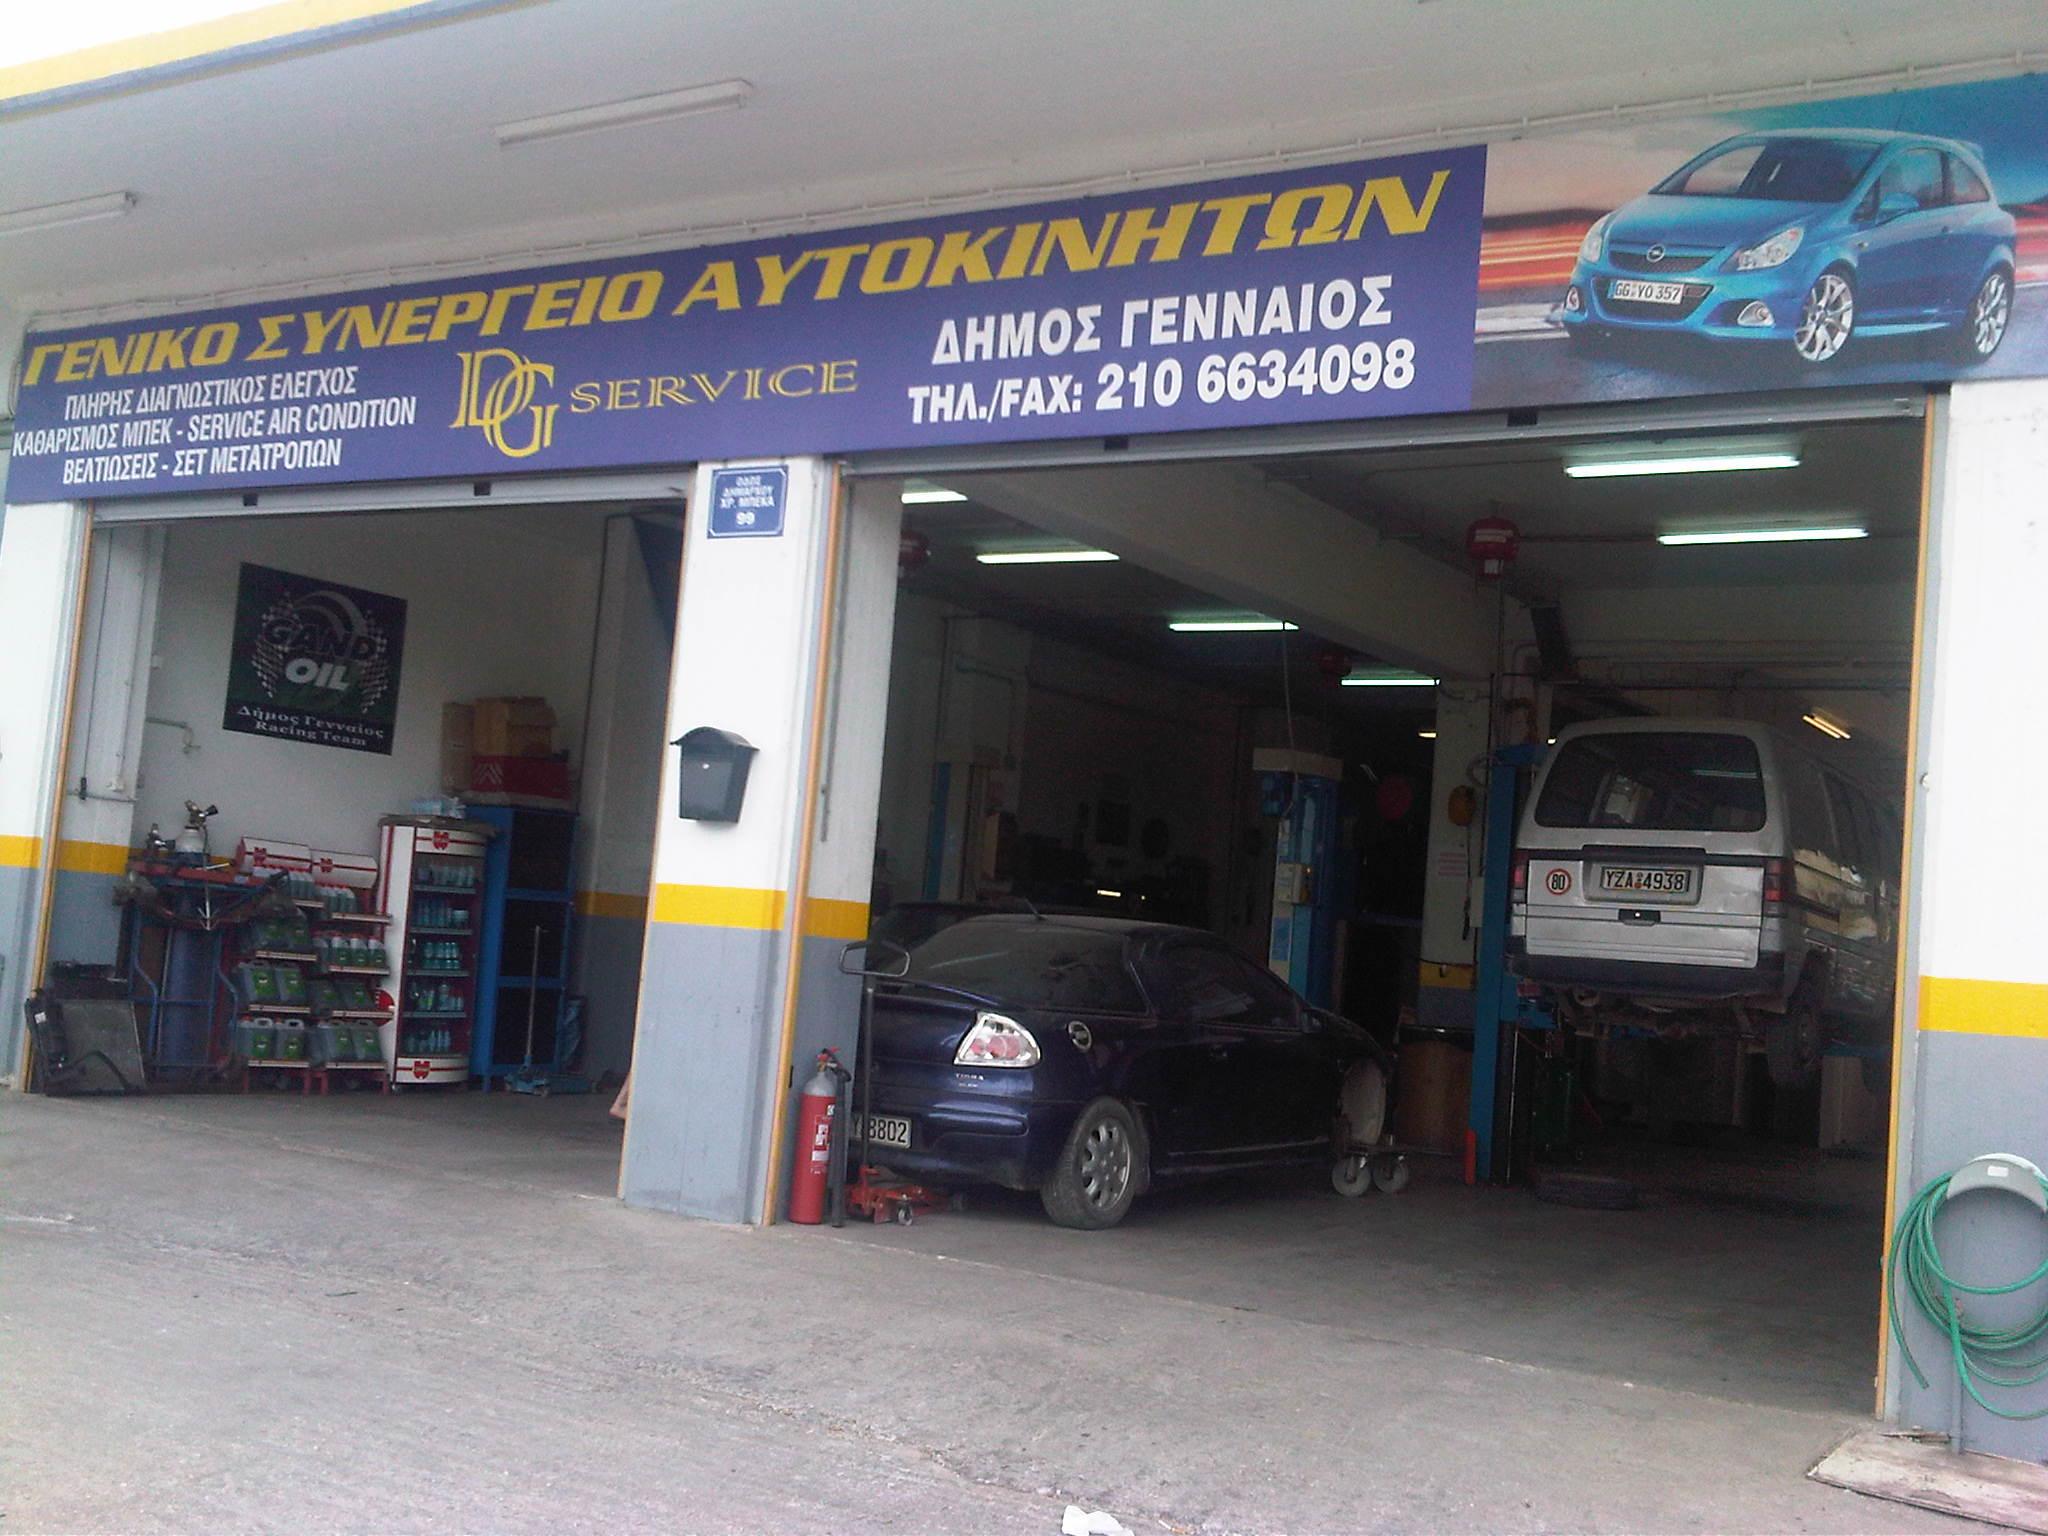 service αυτοκινήτων ανατολικη αττικη , σπατα